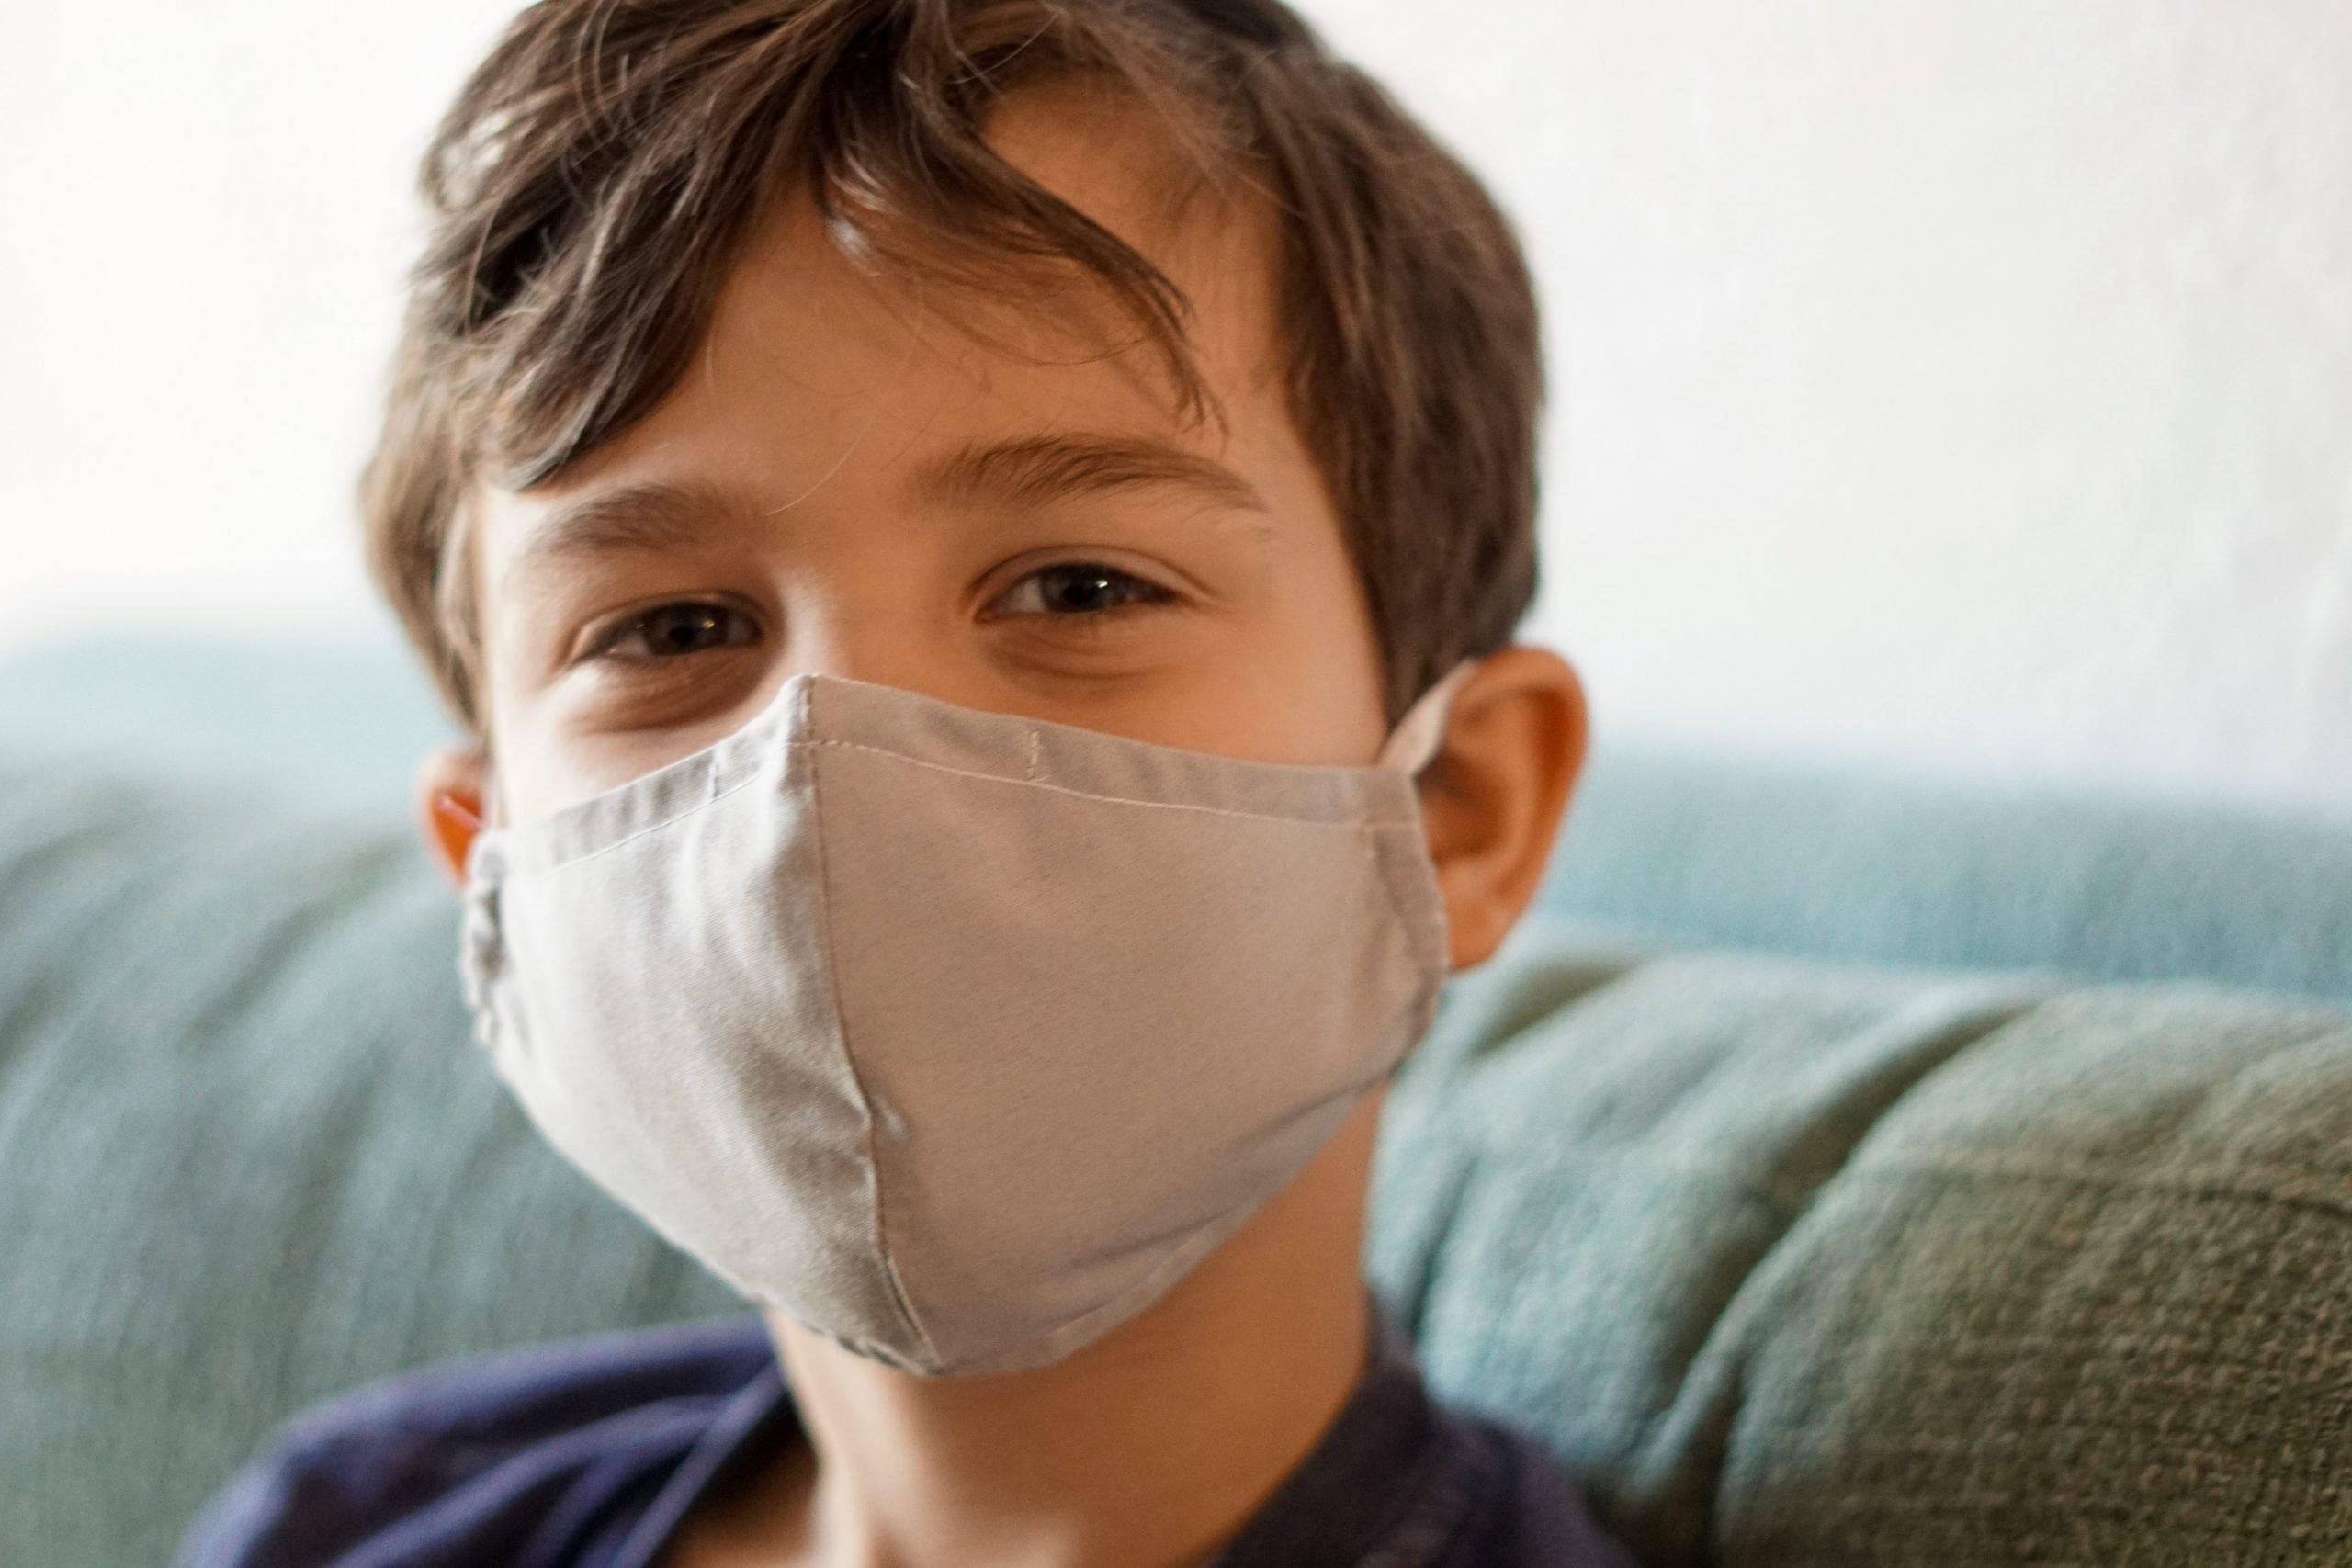 Advierten de posible 'doble pandemia' de COVID-19 y gripe